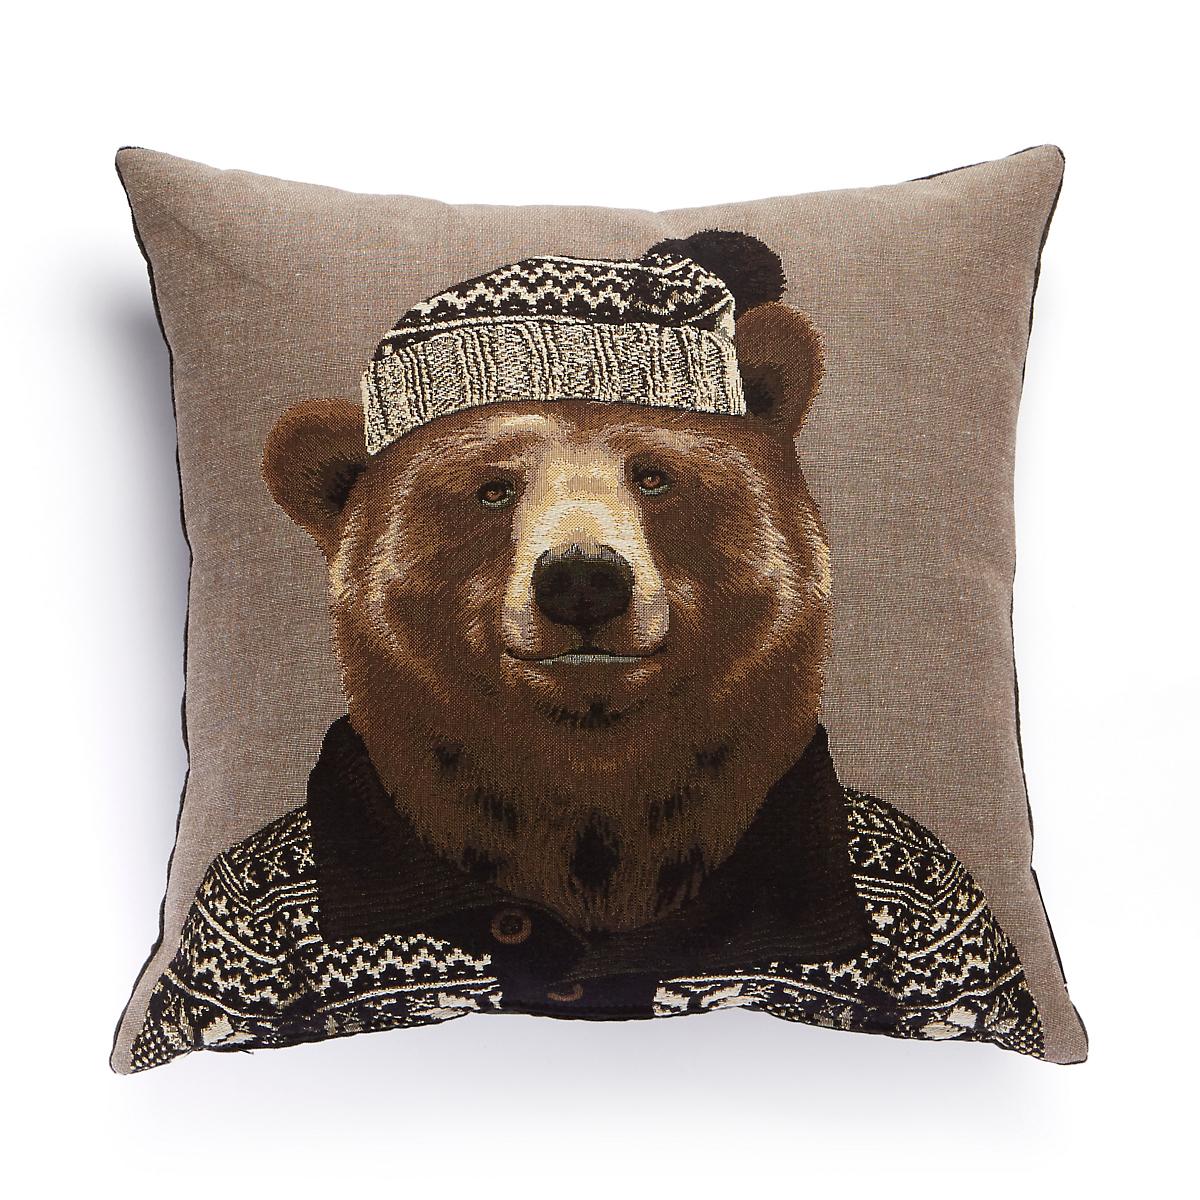 Cozy Critters Bear Pillow